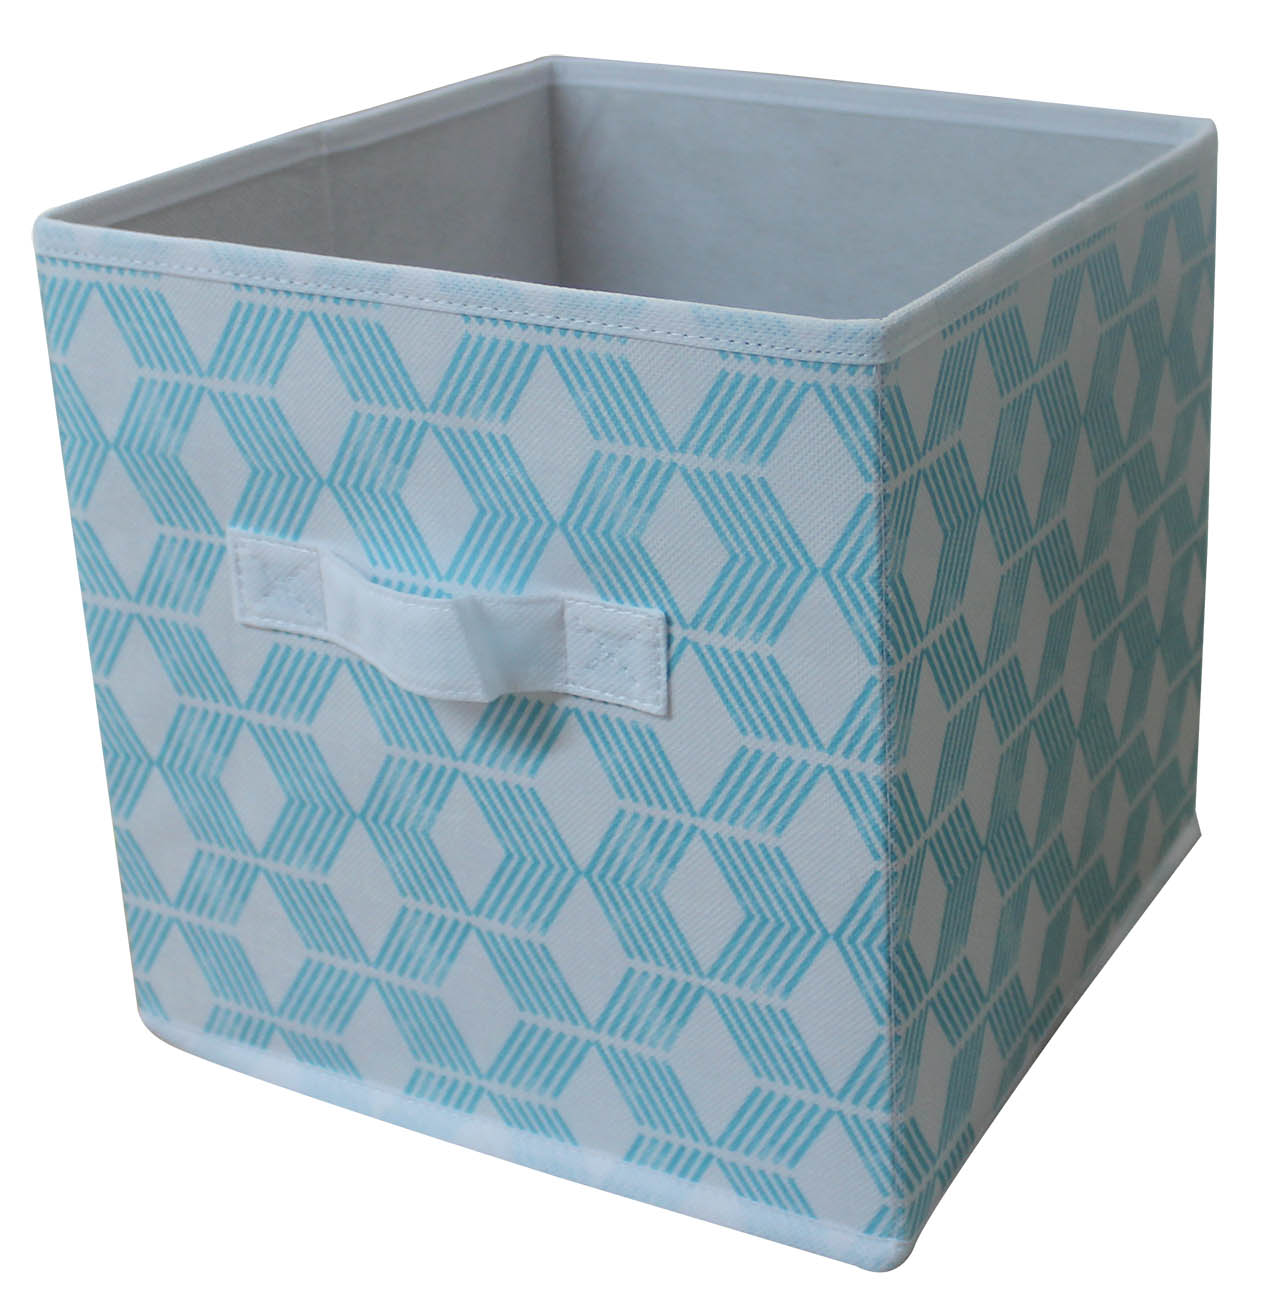 "Mainstays collapsible 10.5"" x 10.5"" cube storage bins, Aqua Diamond"